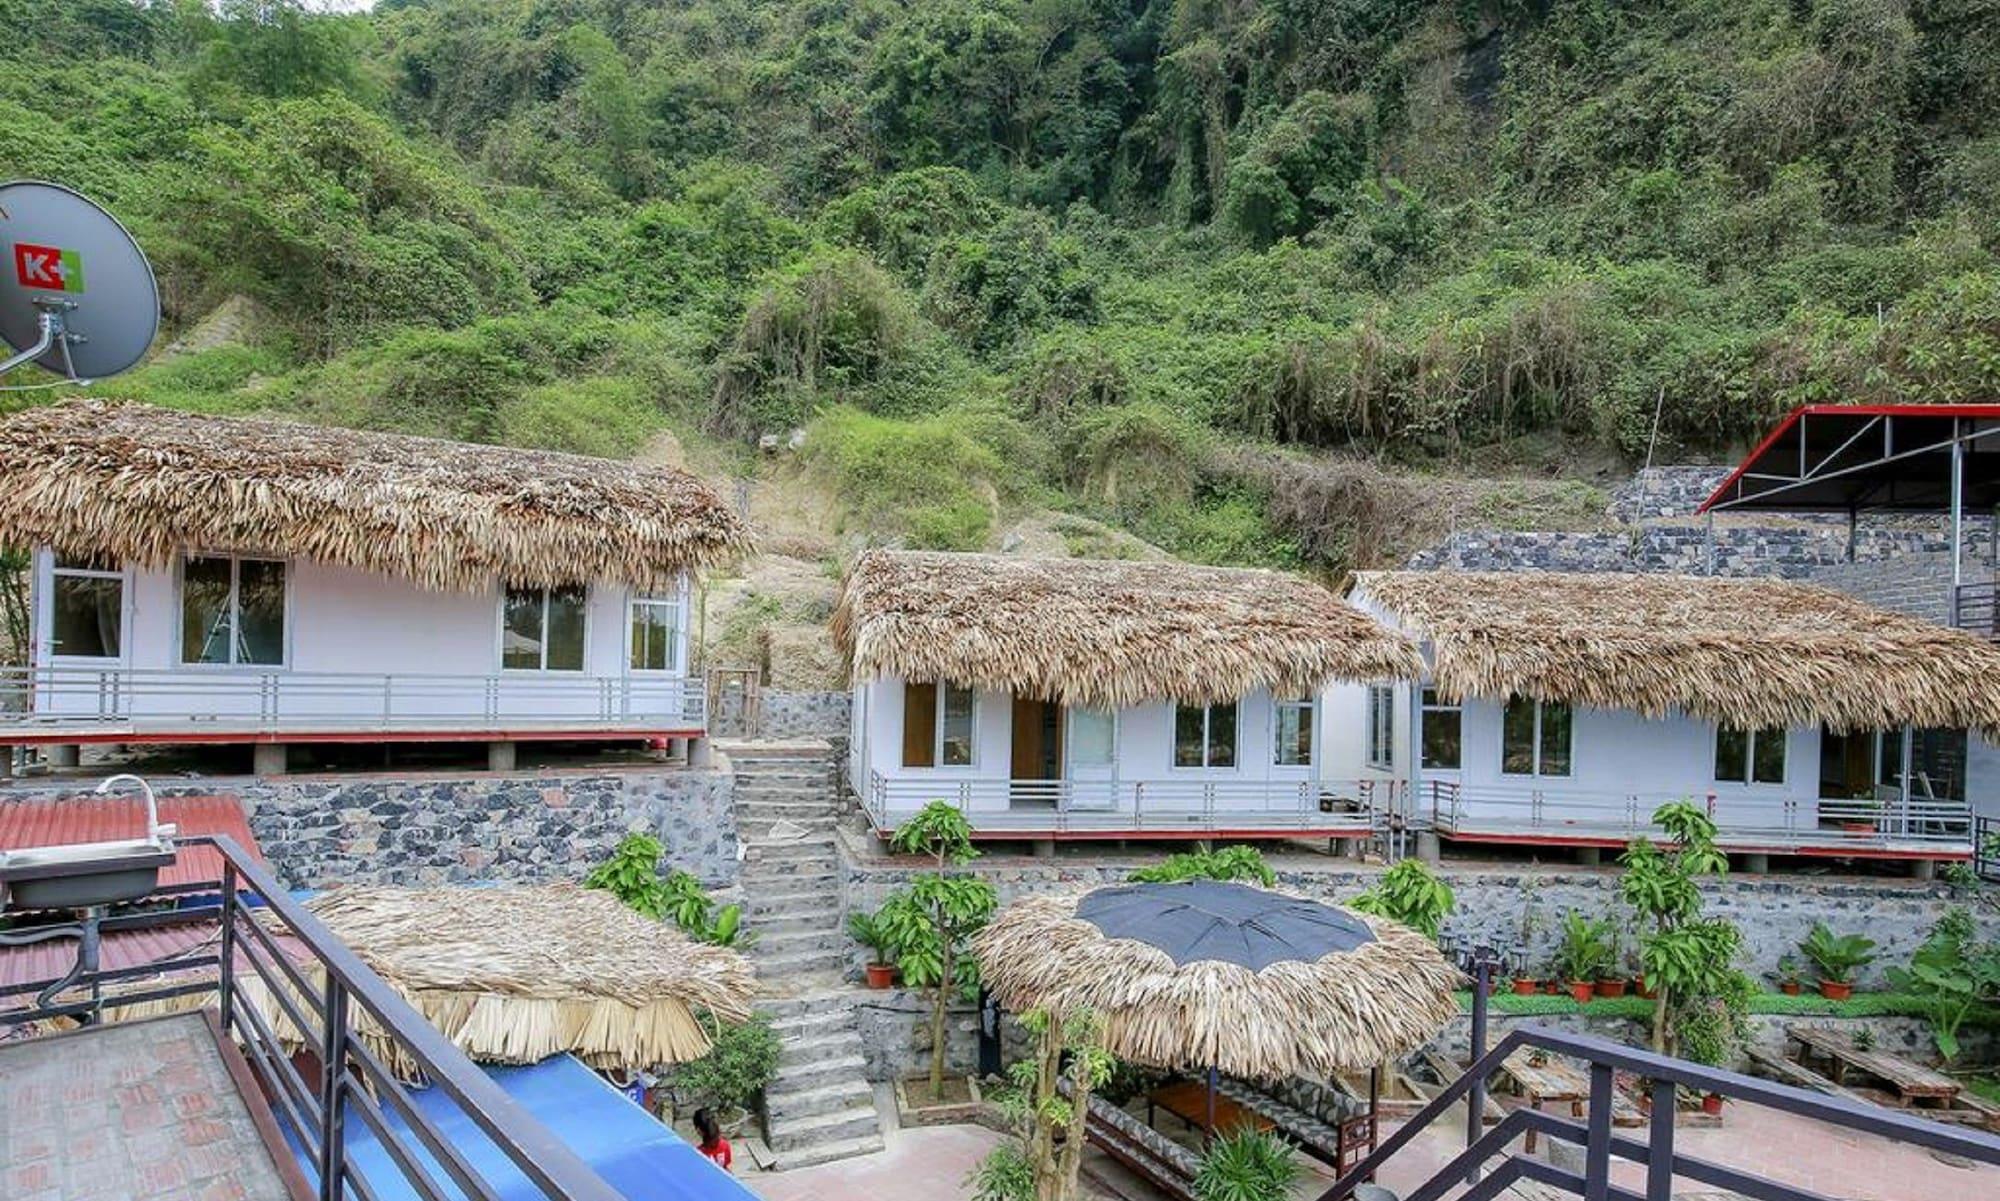 Catba Oasis Bungalows - Hostel, Cát Hải